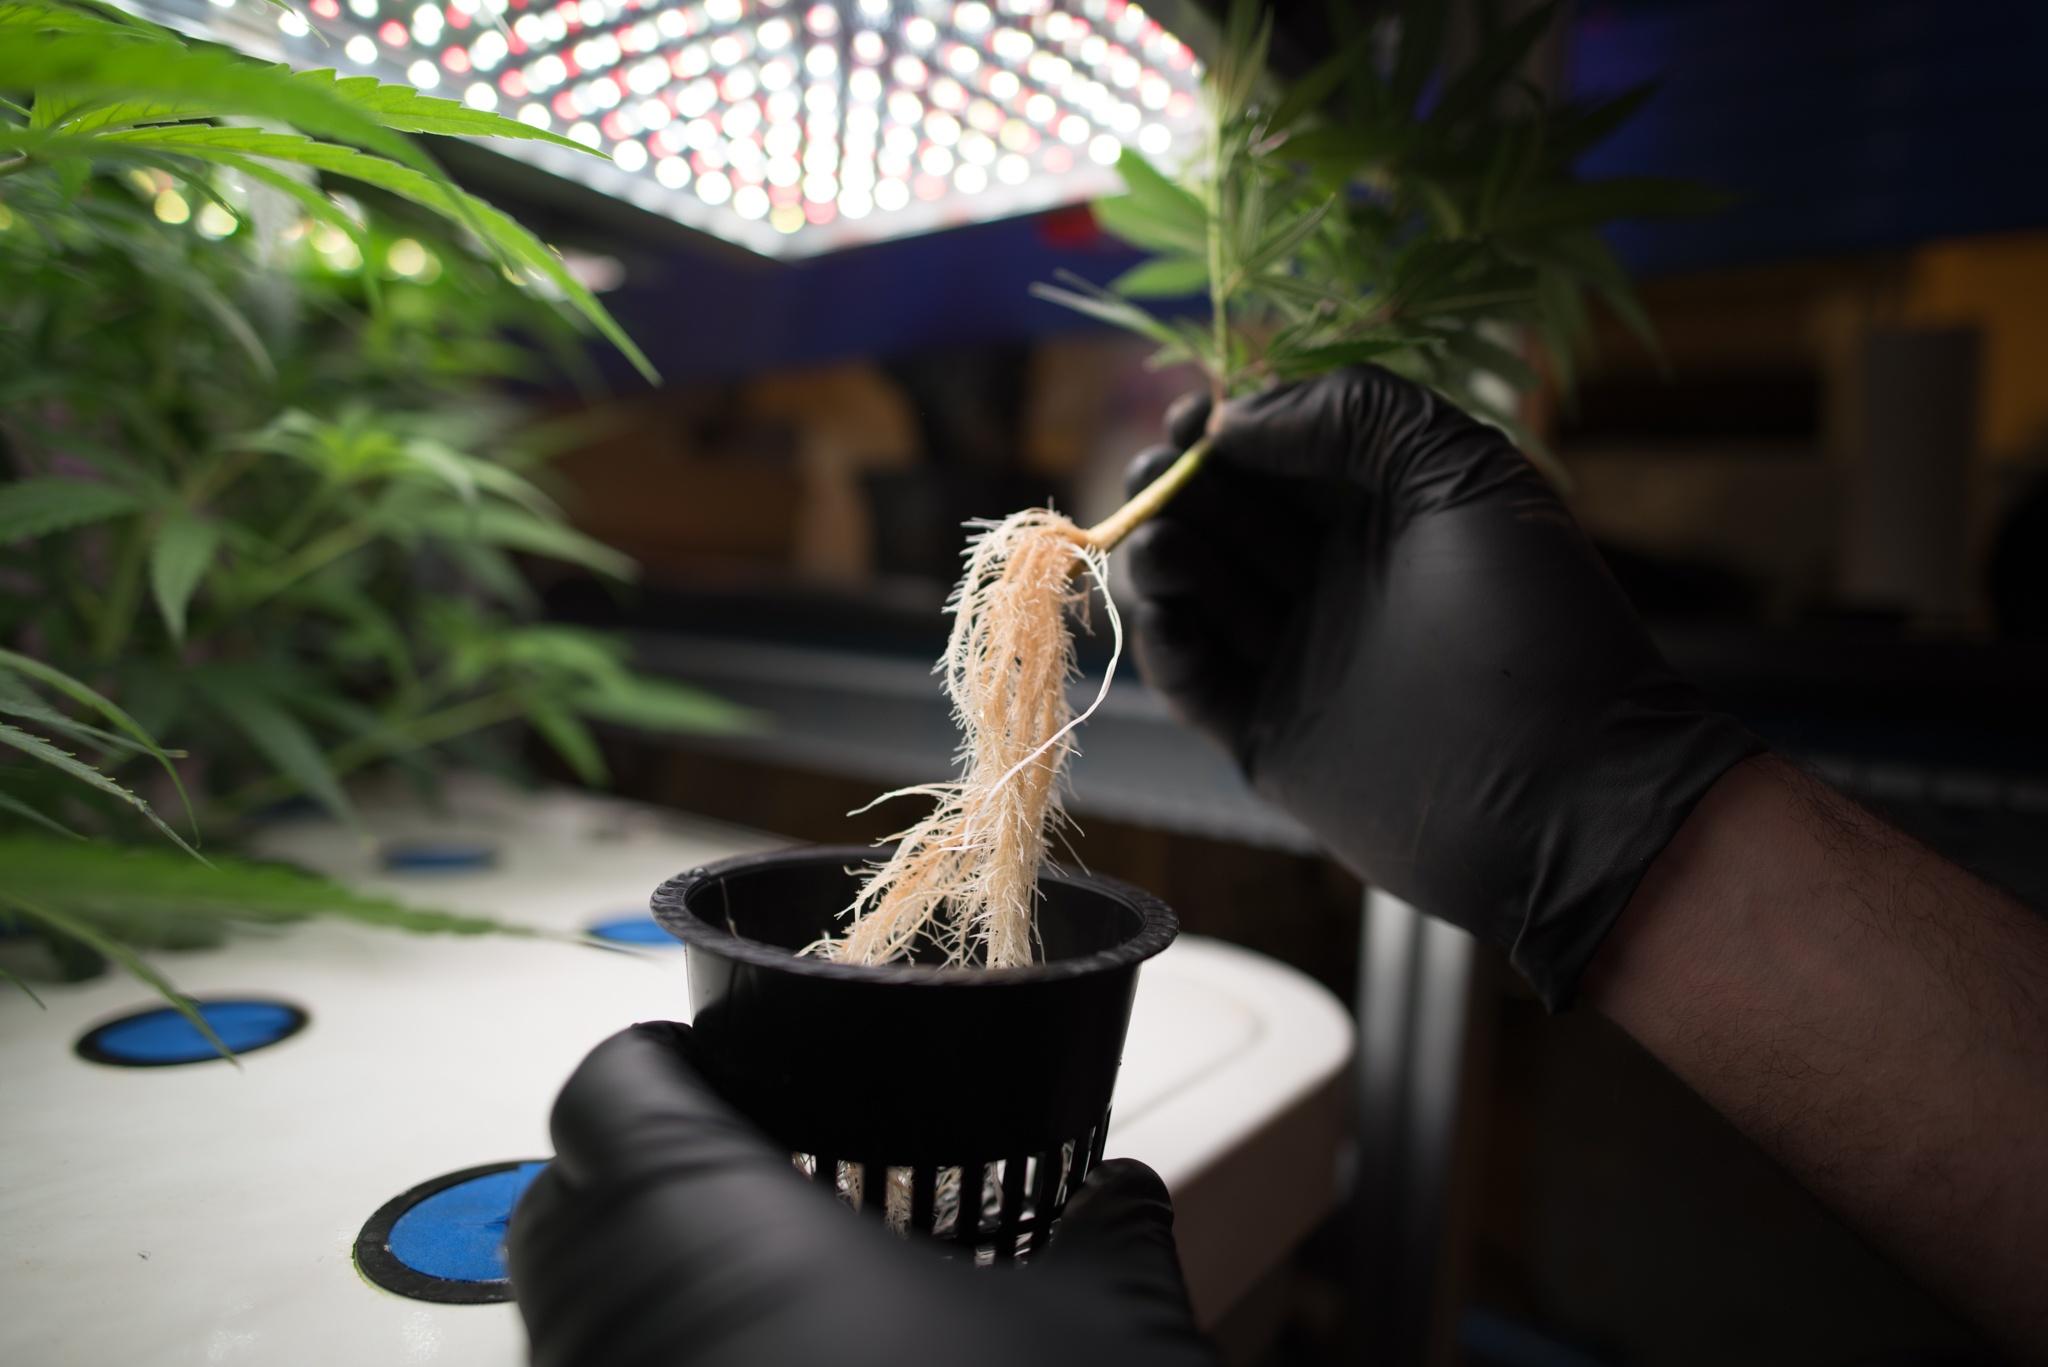 Cloning Transfer to Bloom Net Pot